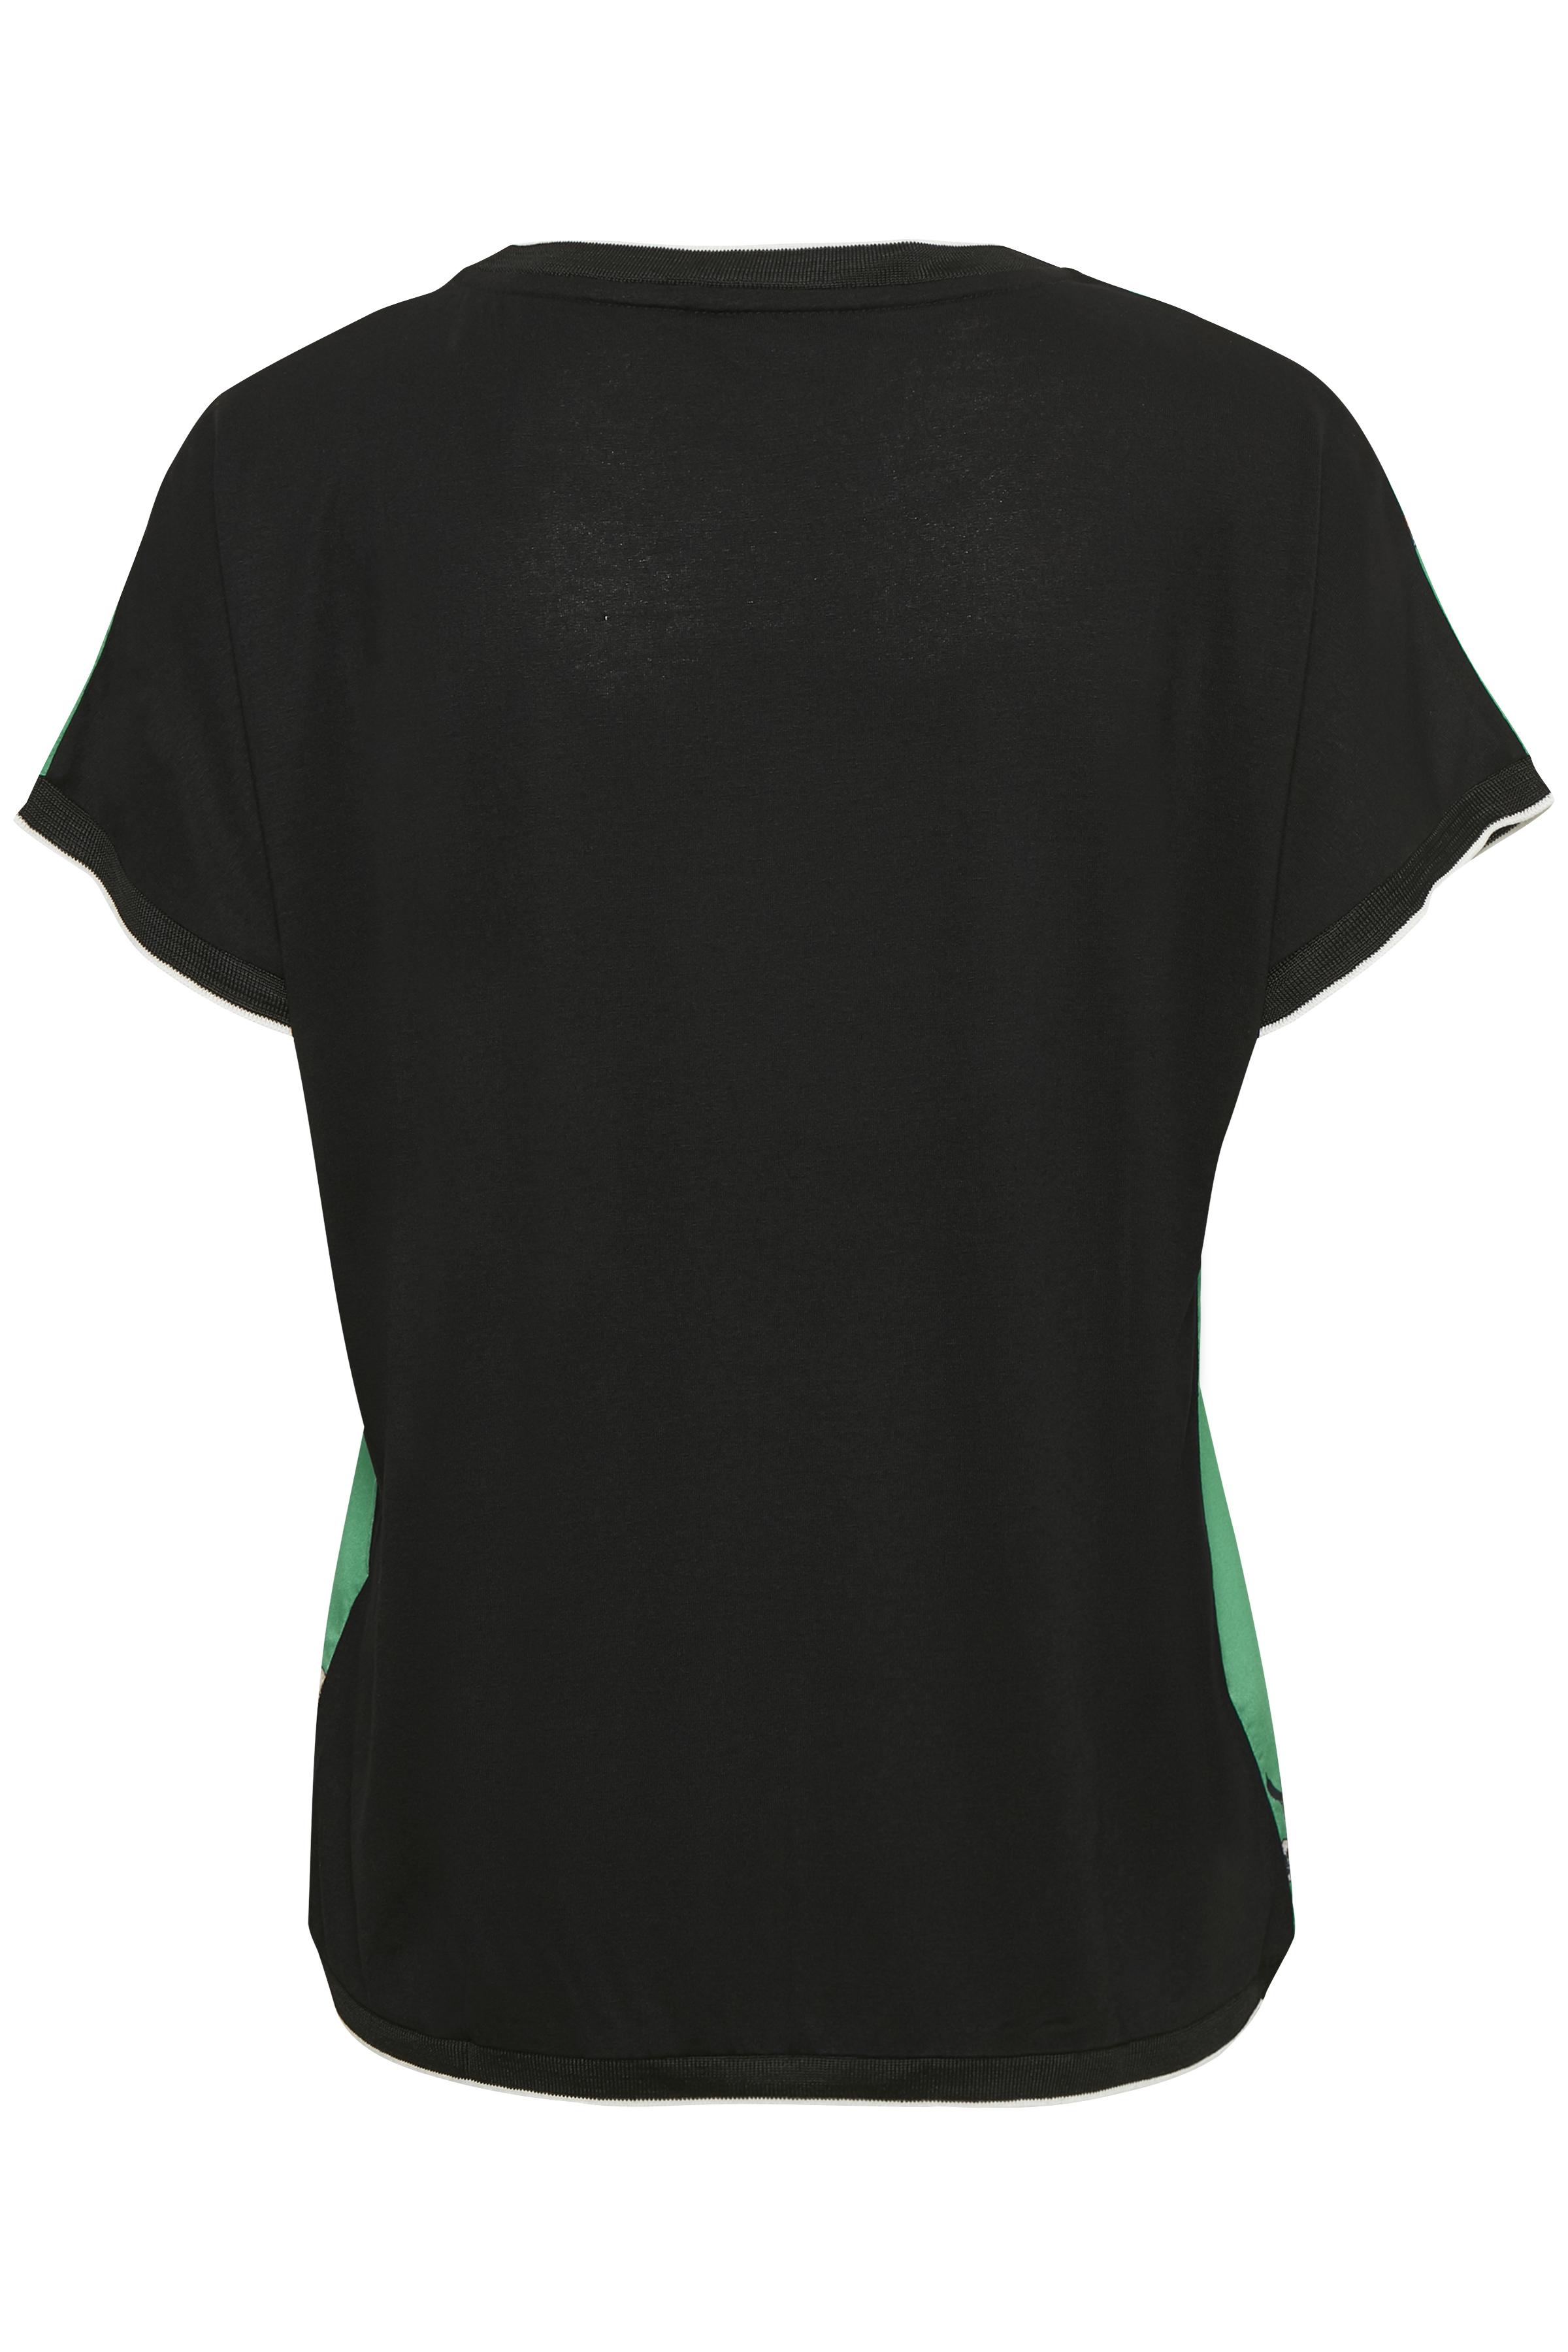 Turkisgrøn/sort Kortærmet T-shirt fra b.young – Køb Turkisgrøn/sort Kortærmet T-shirt fra str. XS-XXL her